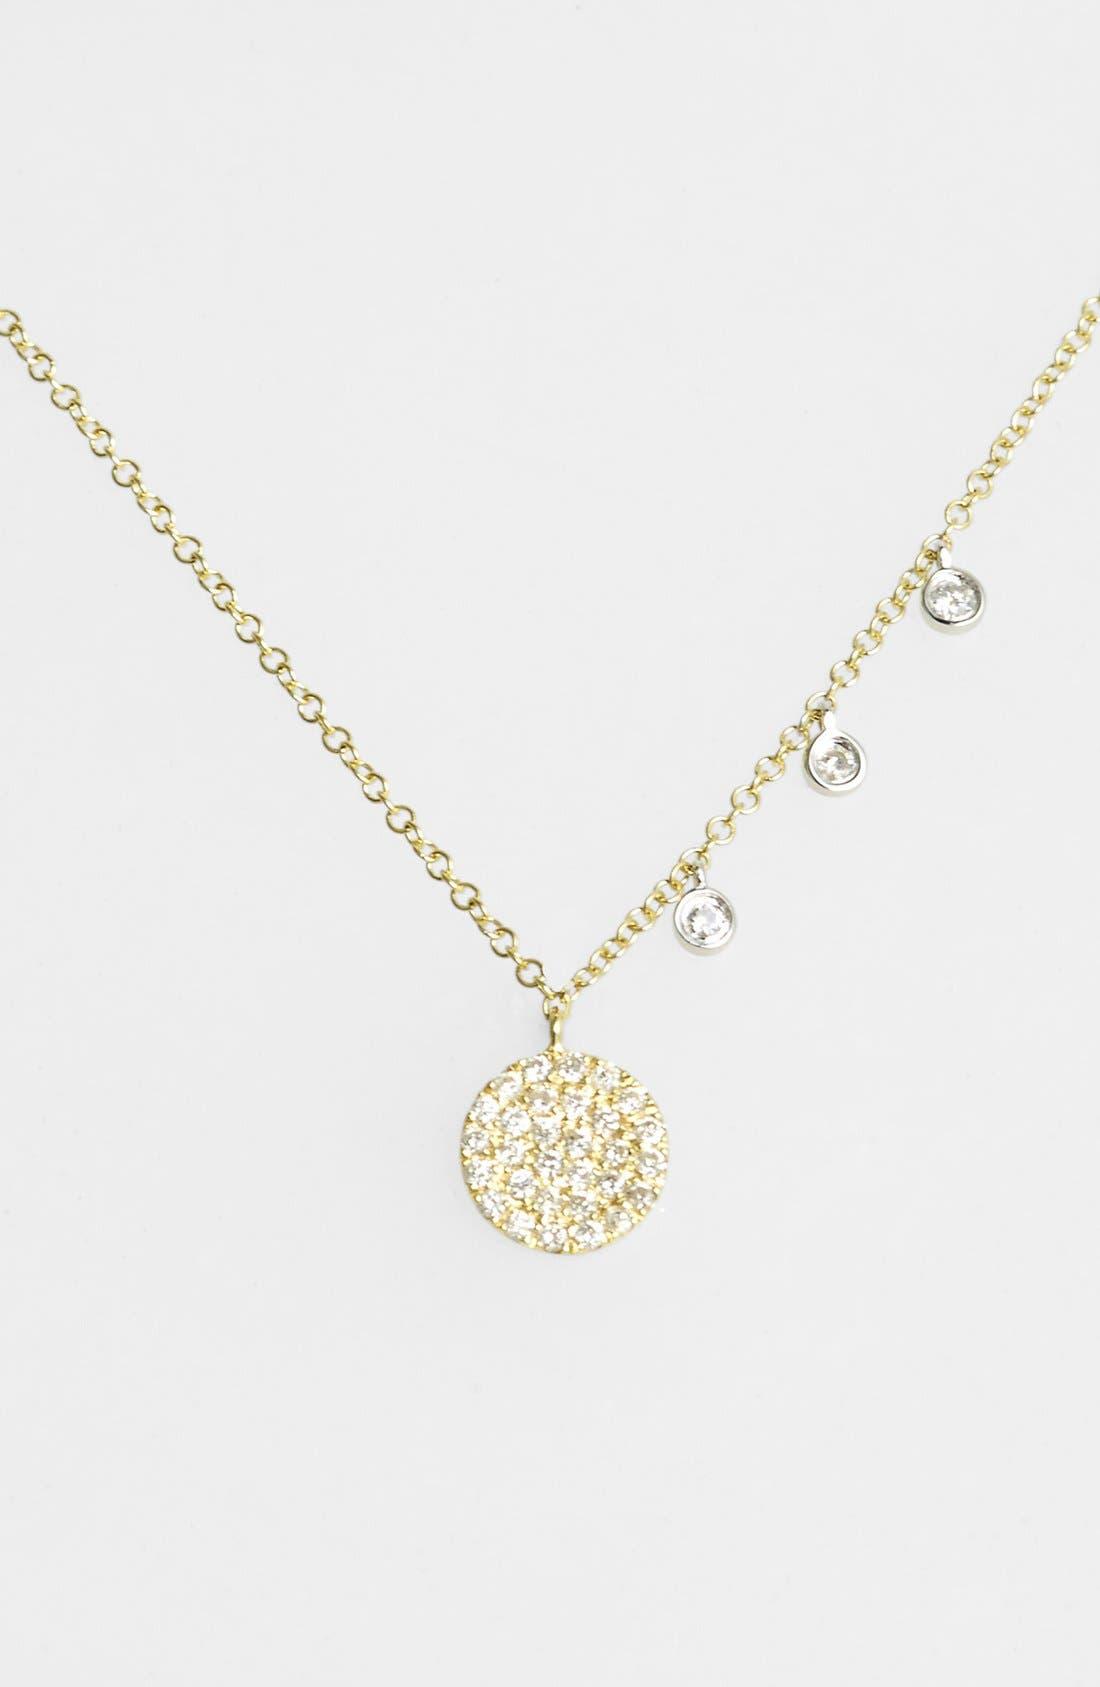 Dazzling Diamond Disc Pendant Necklace,                         Main,                         color, YELLOW GOLD